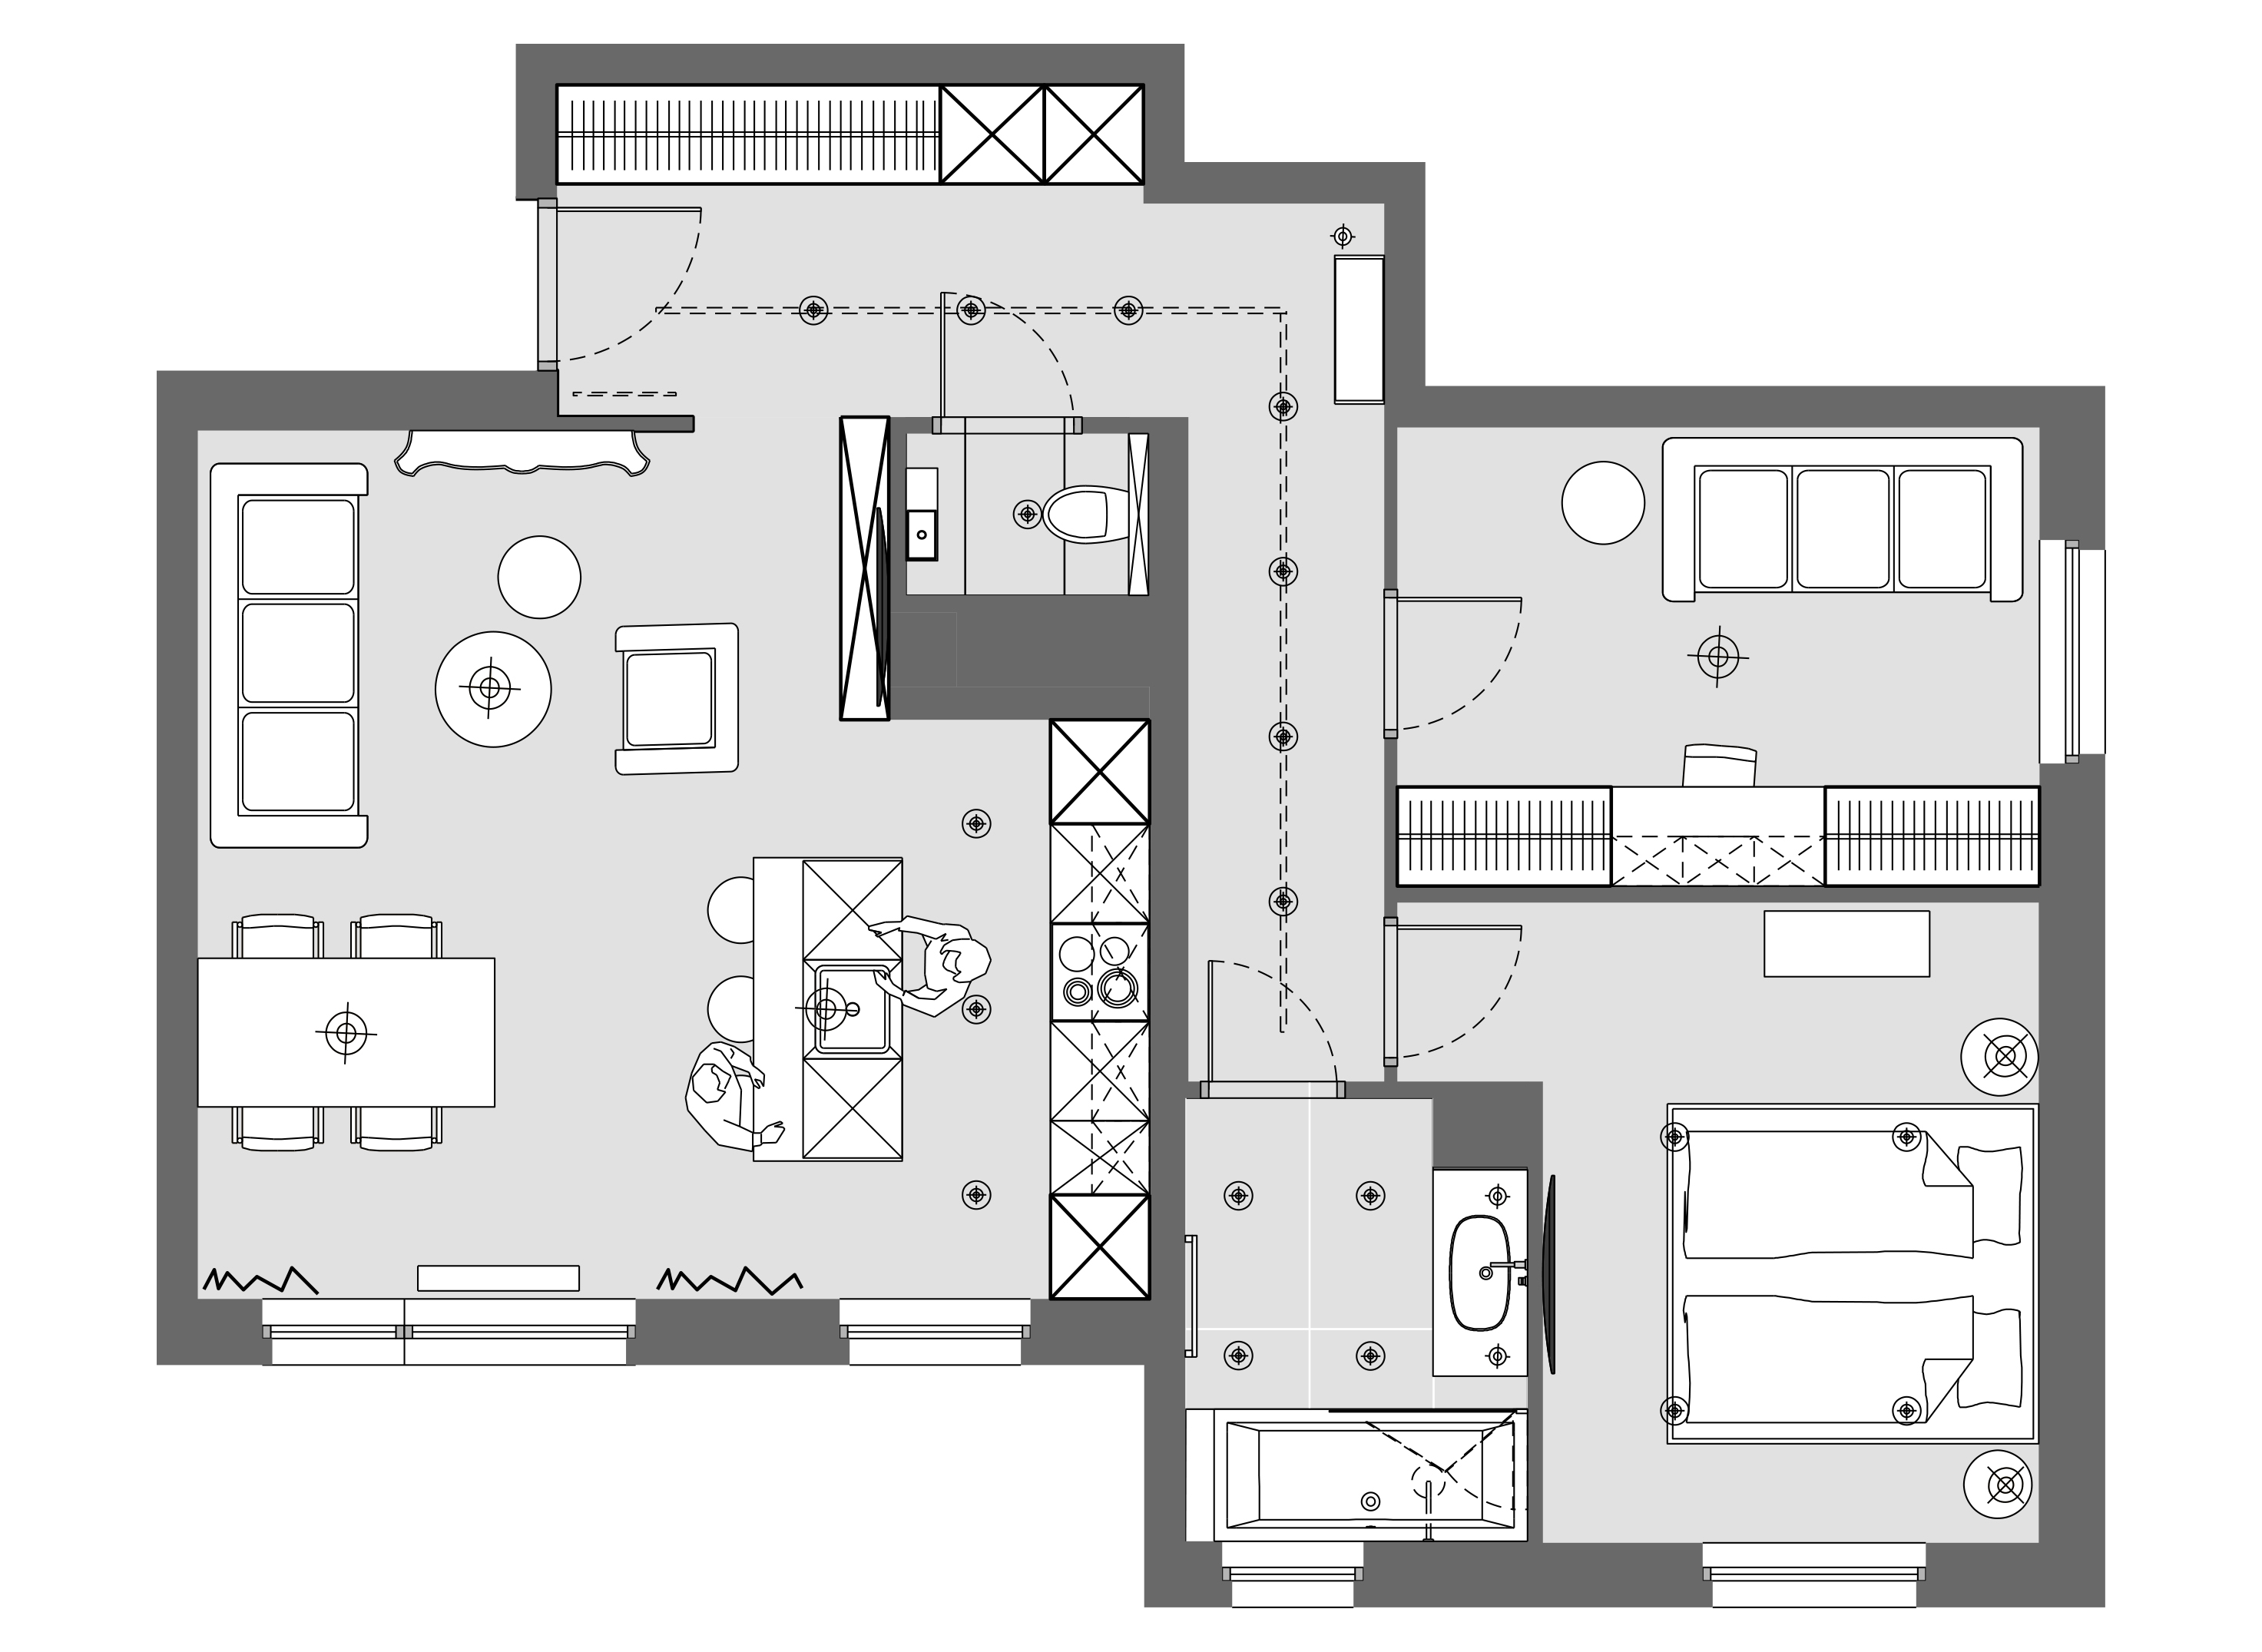 apartament dla dwojga rzut mieszkania